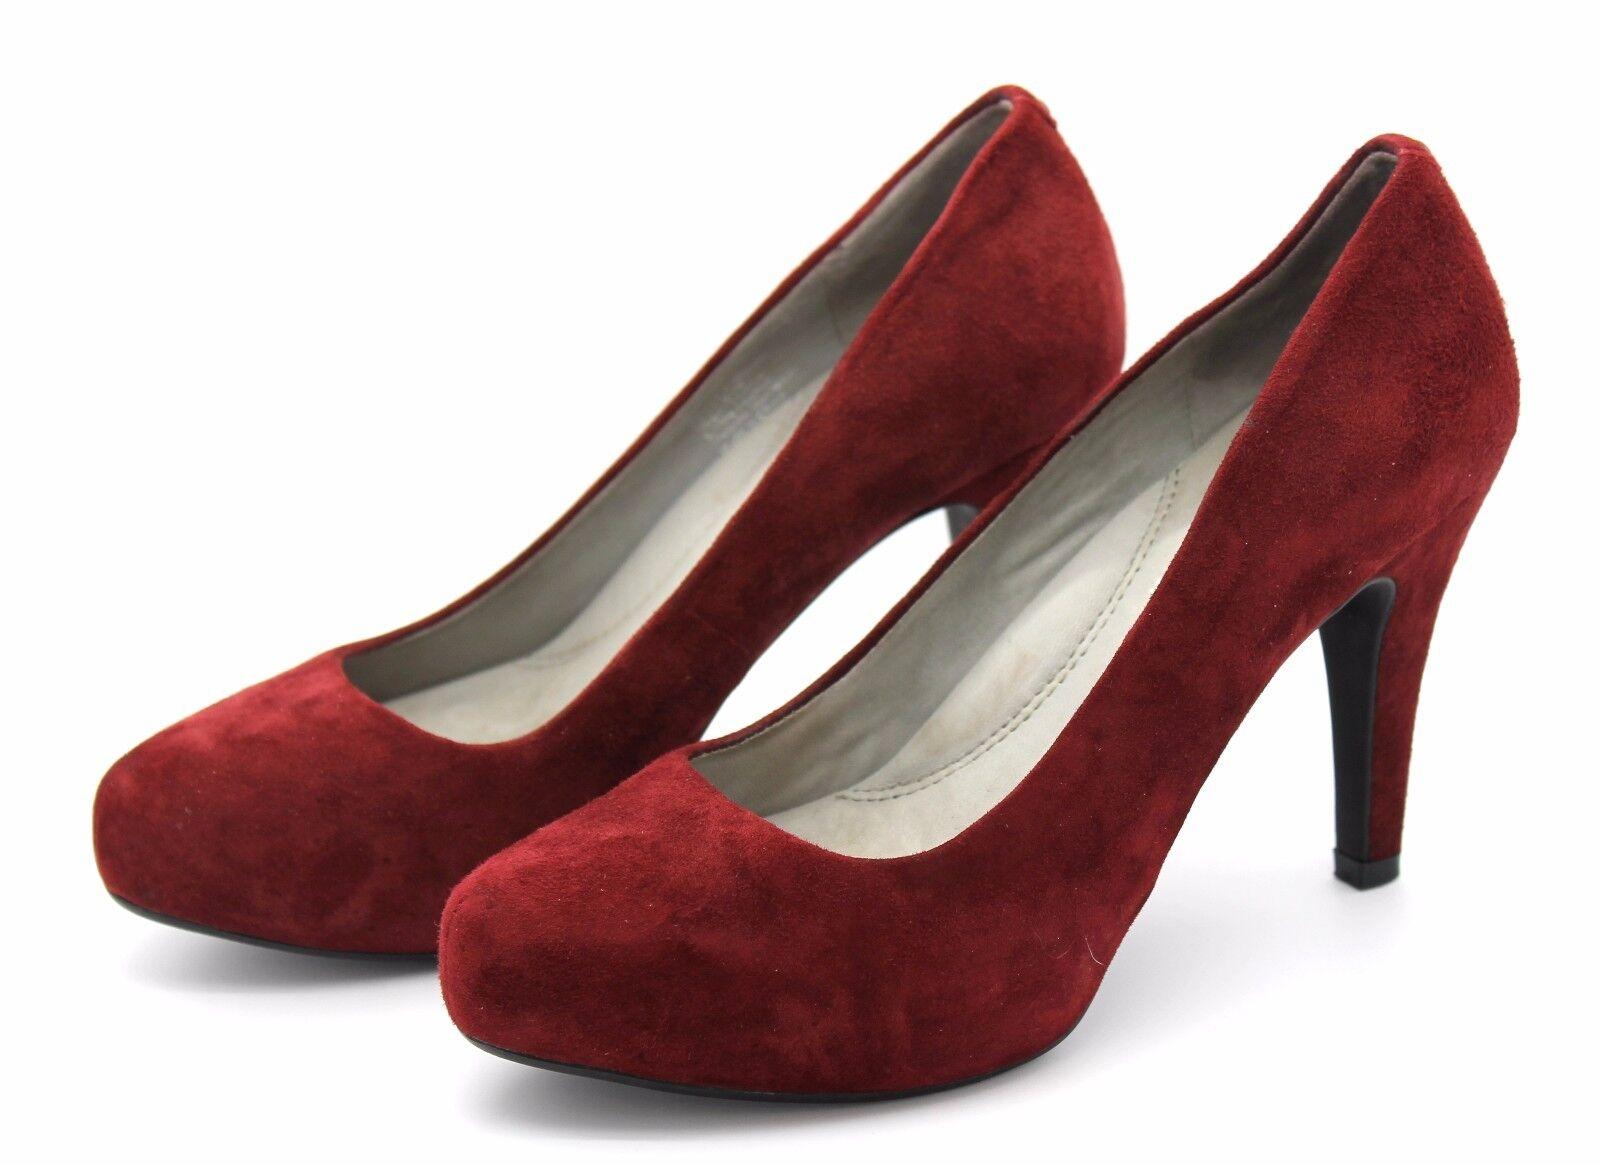 Kenneth Cole New York damen UK 4.5 EU 37 Ruby rot Suede High Heel Court schuhe